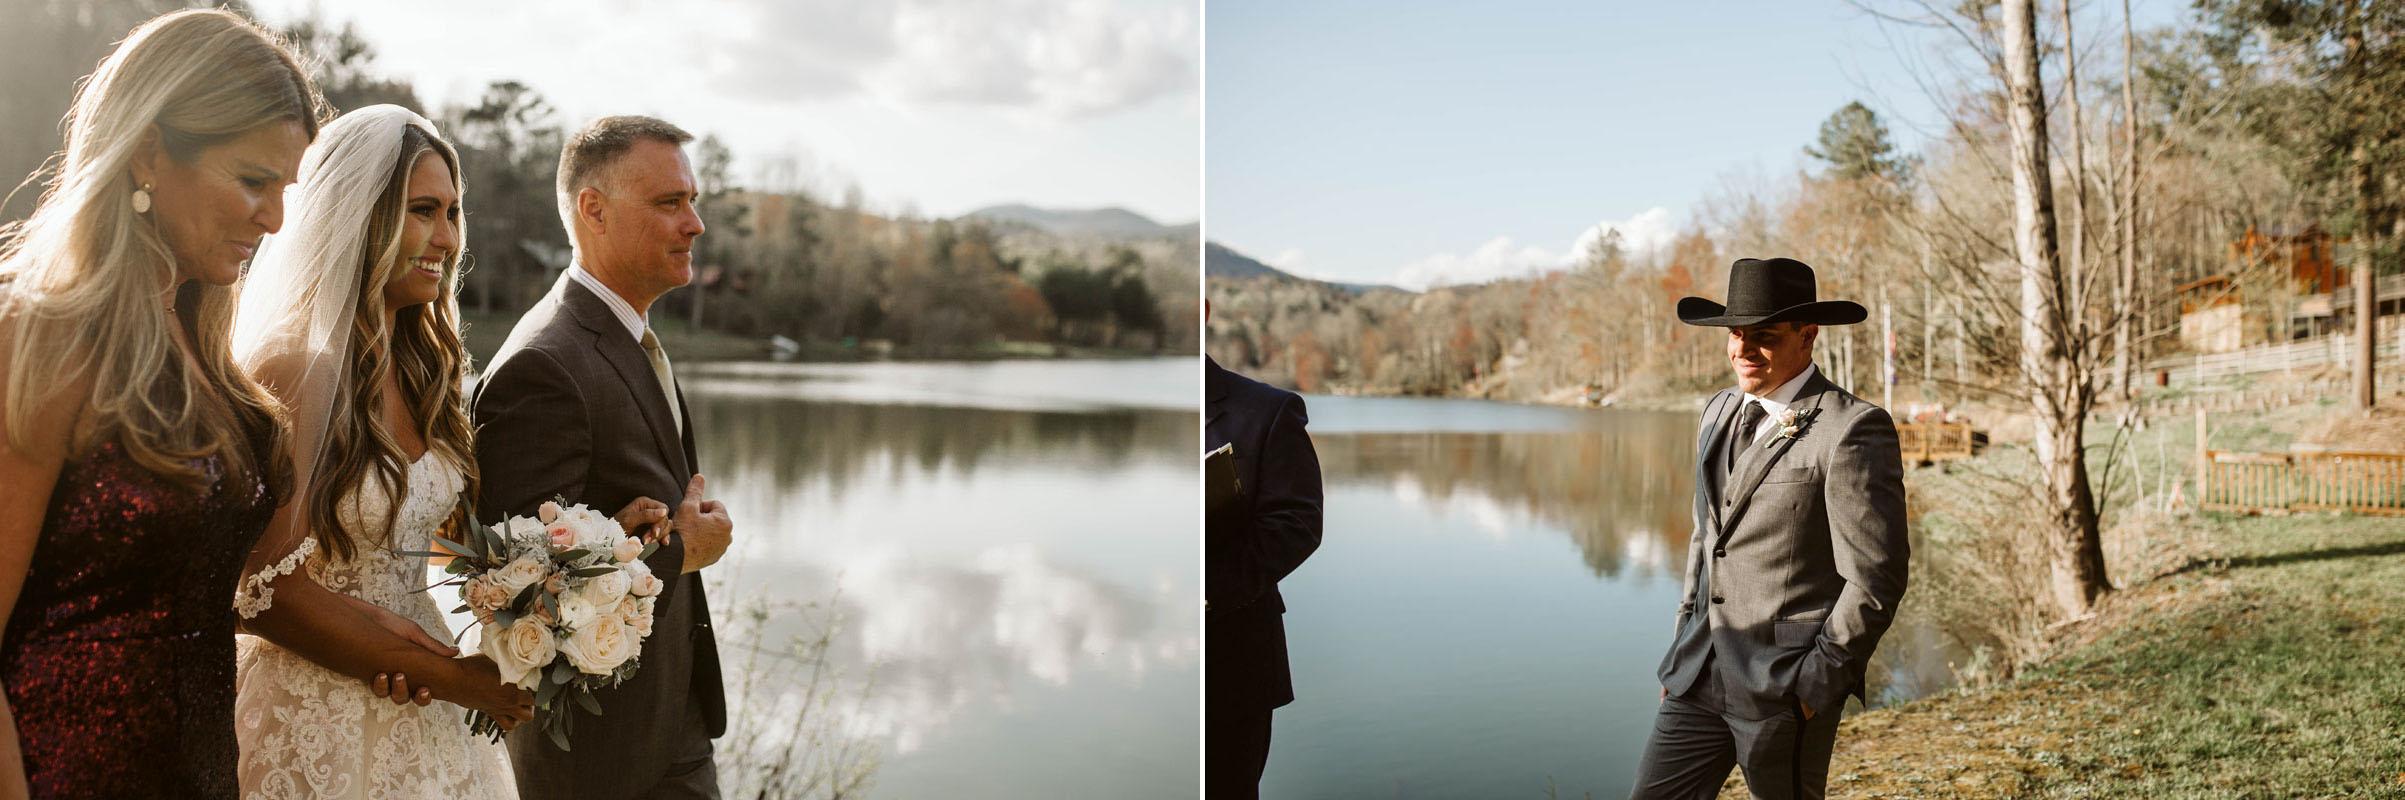 intimate-elopment-blue-ridge-georgia-north-georgia-wedding-photographers (44).jpg